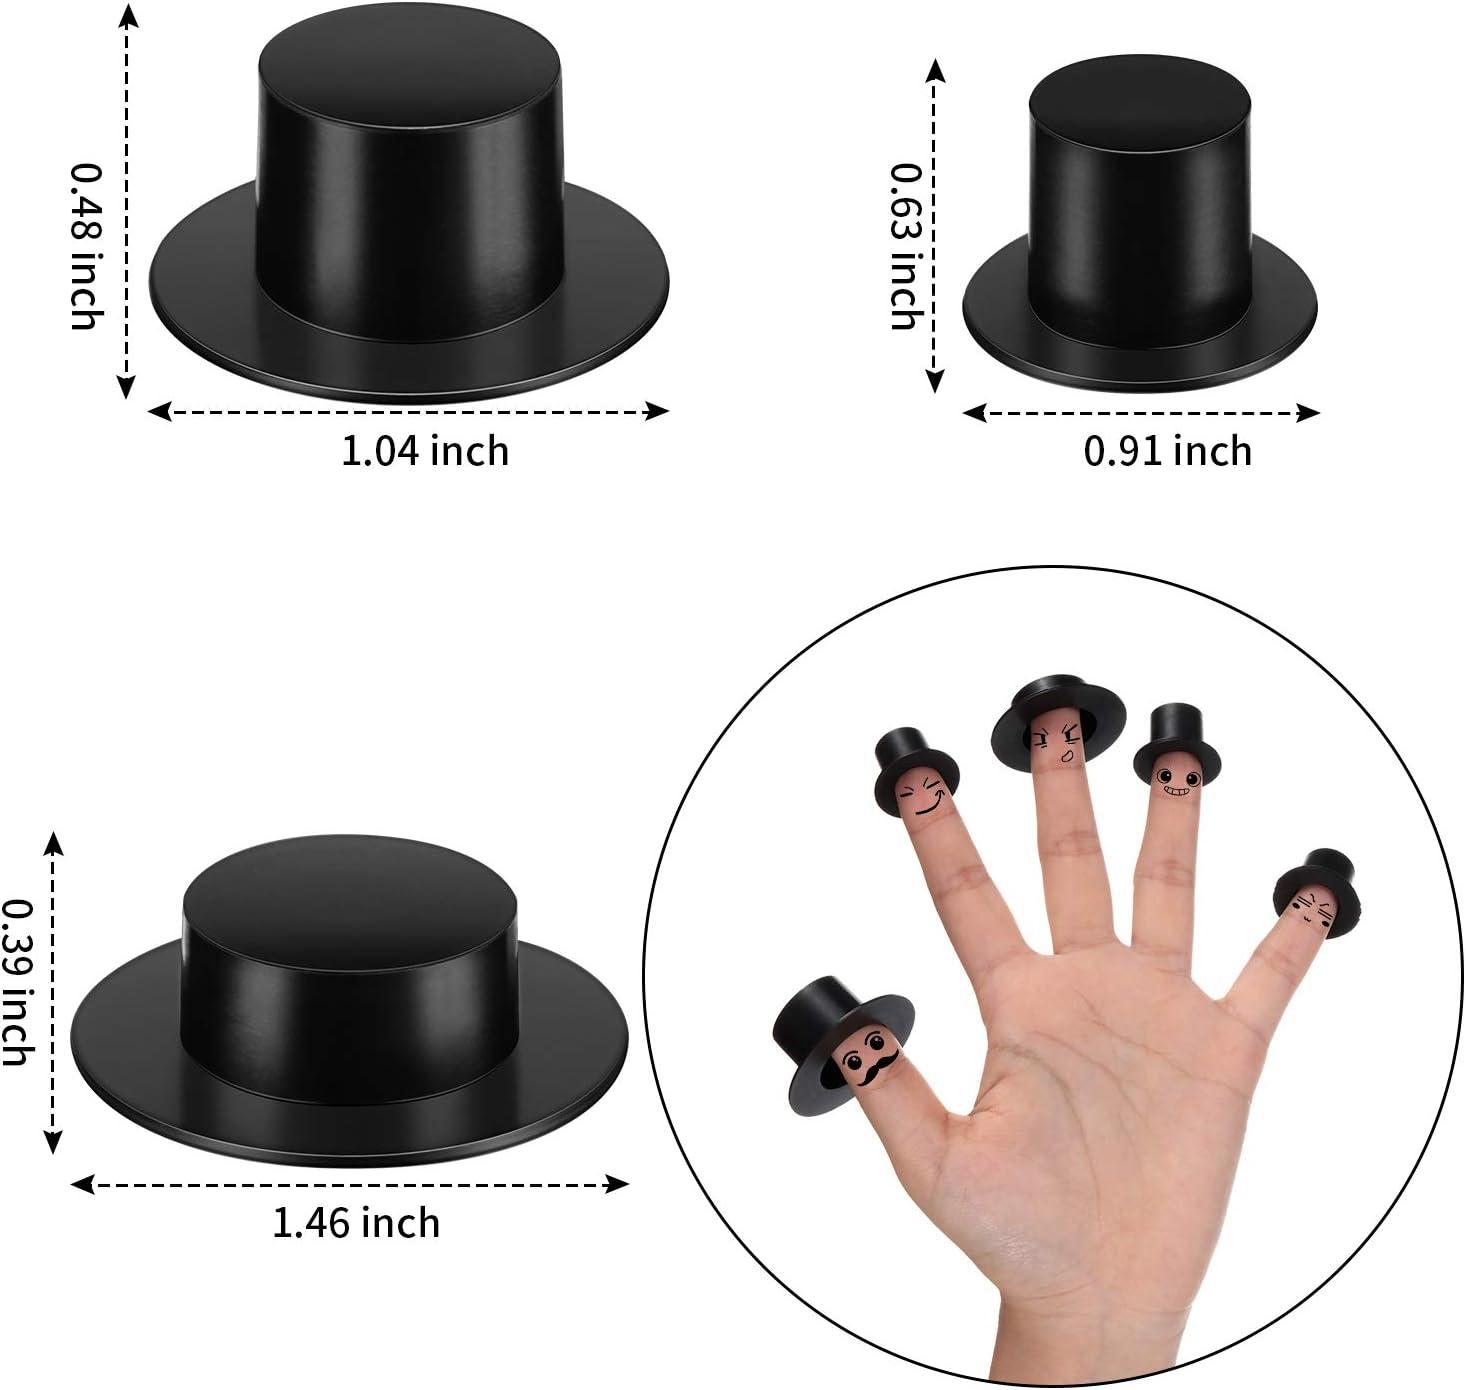 60 Pieces 3 Size Mini Black Top Hats Miniature Snowman Hats Top Hats Plastic for Crafts DIY Decoration Party Supplies